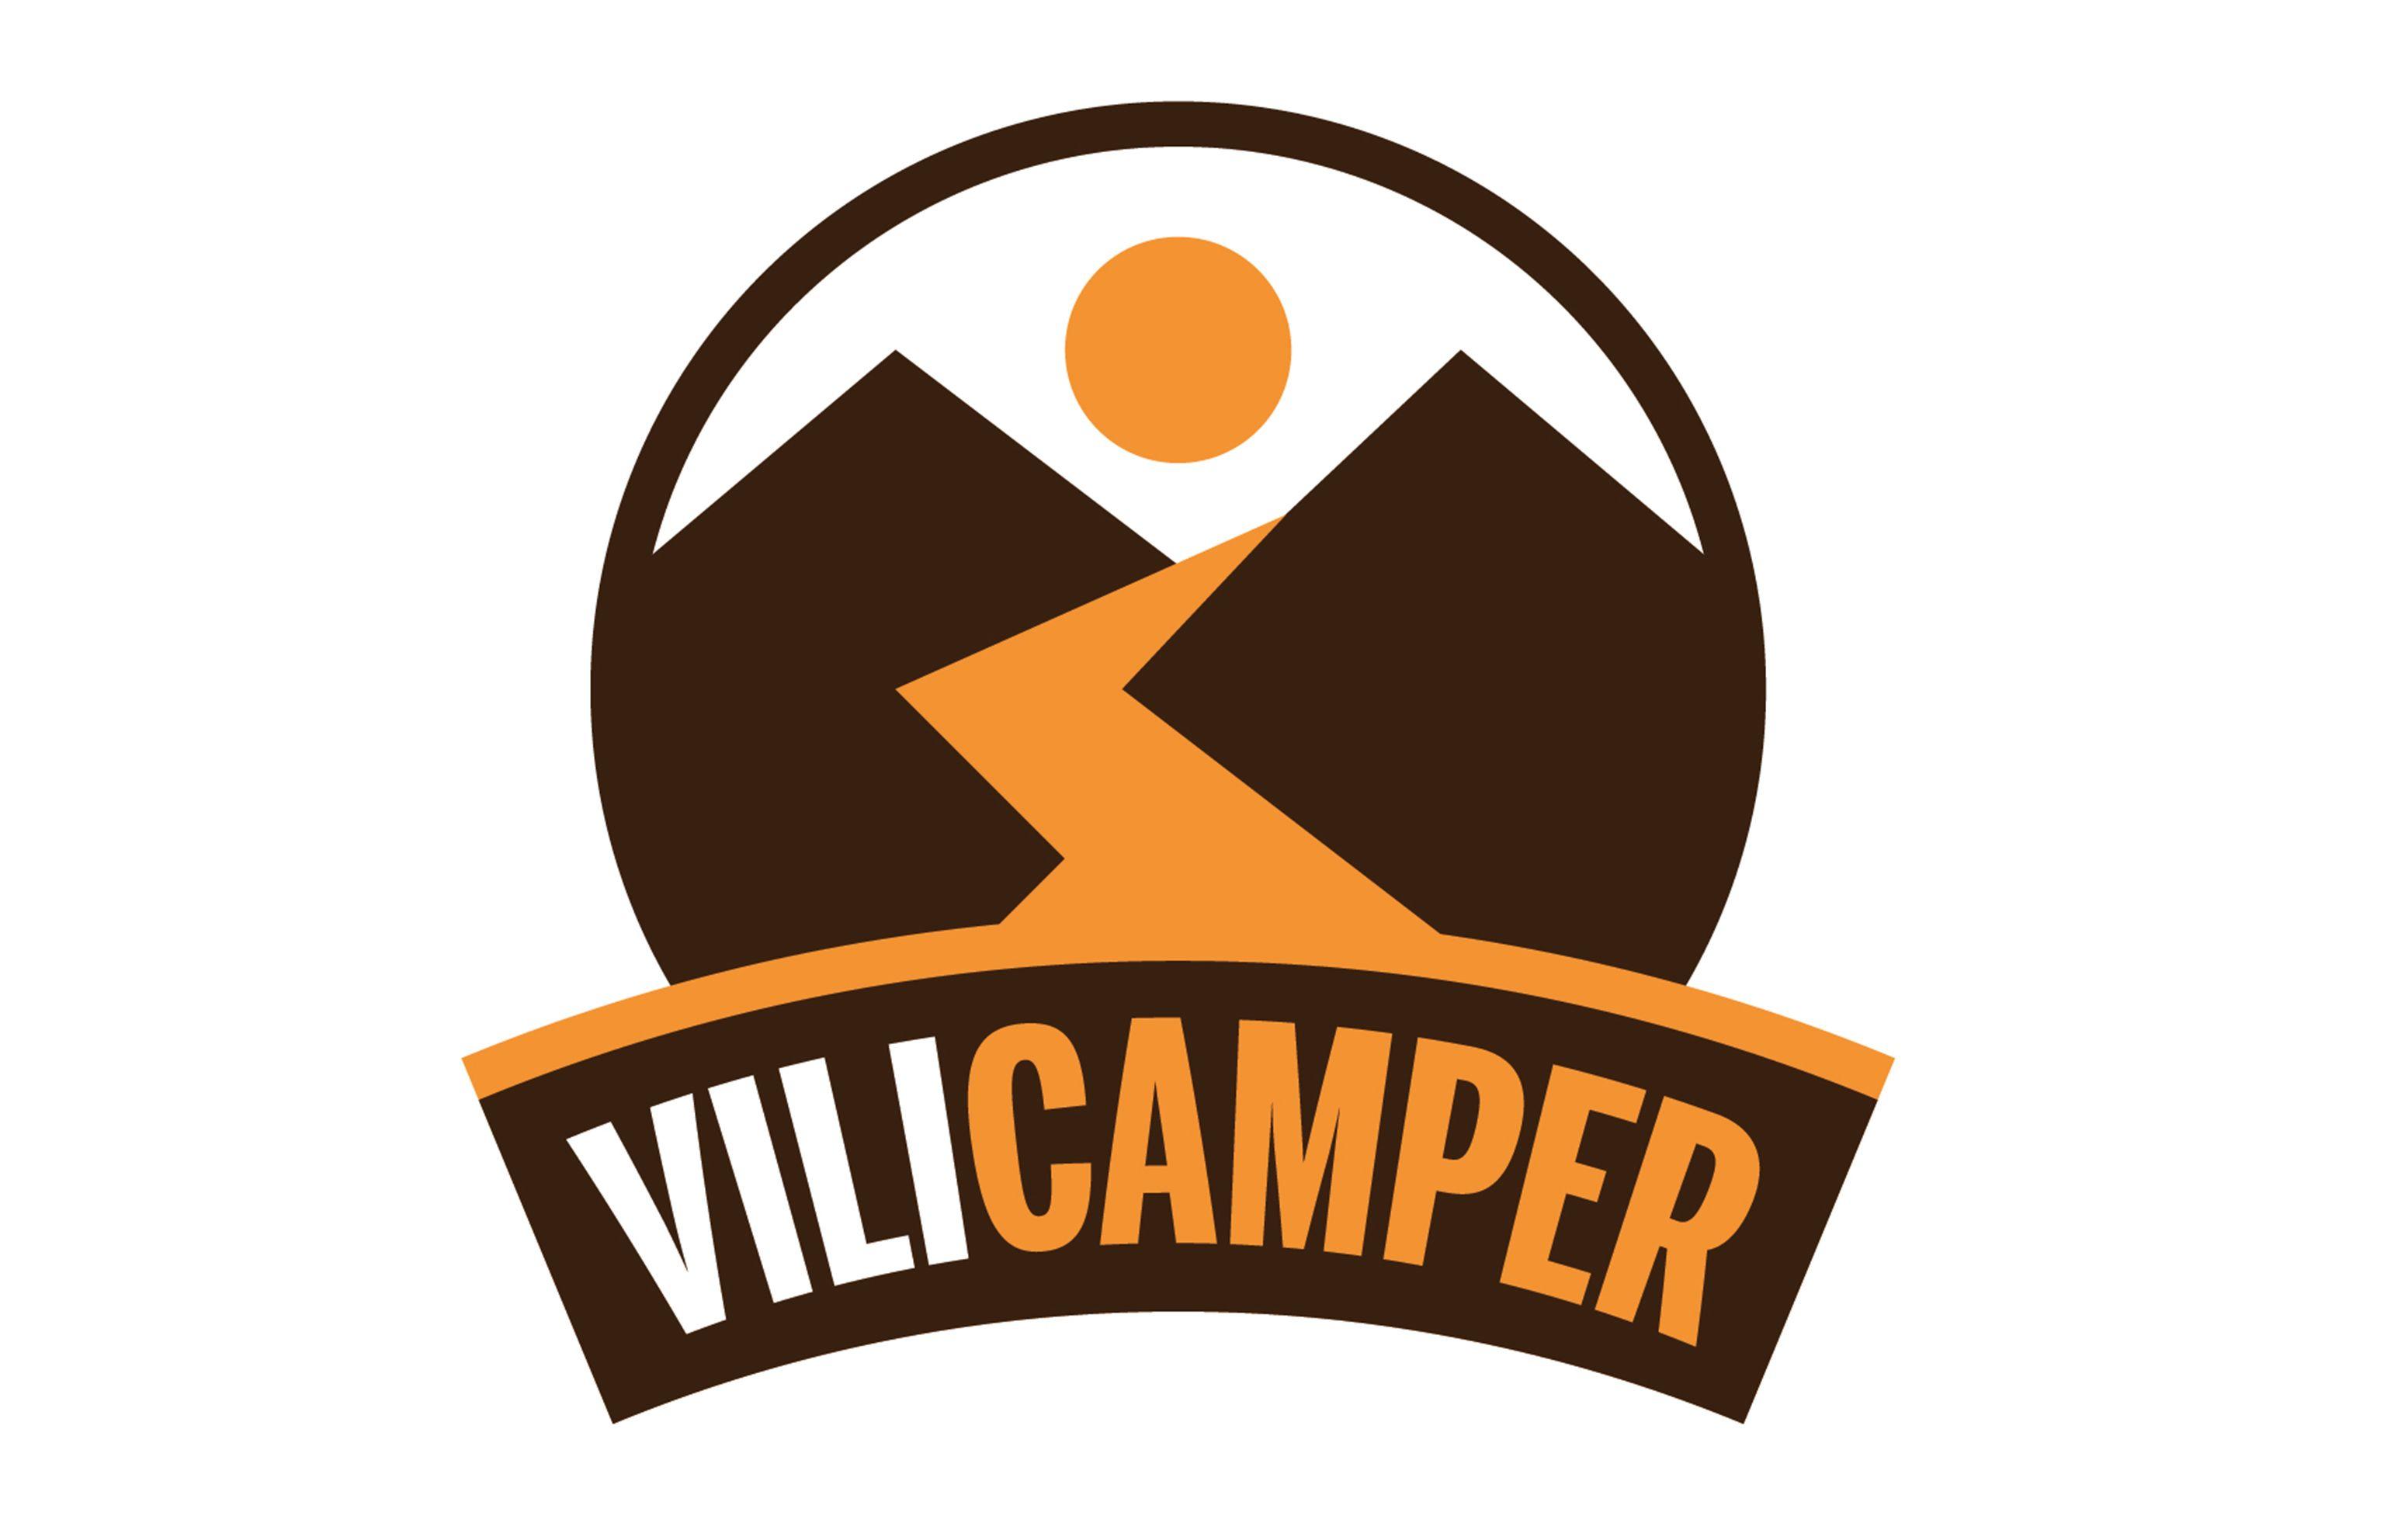 Vili Camper SL